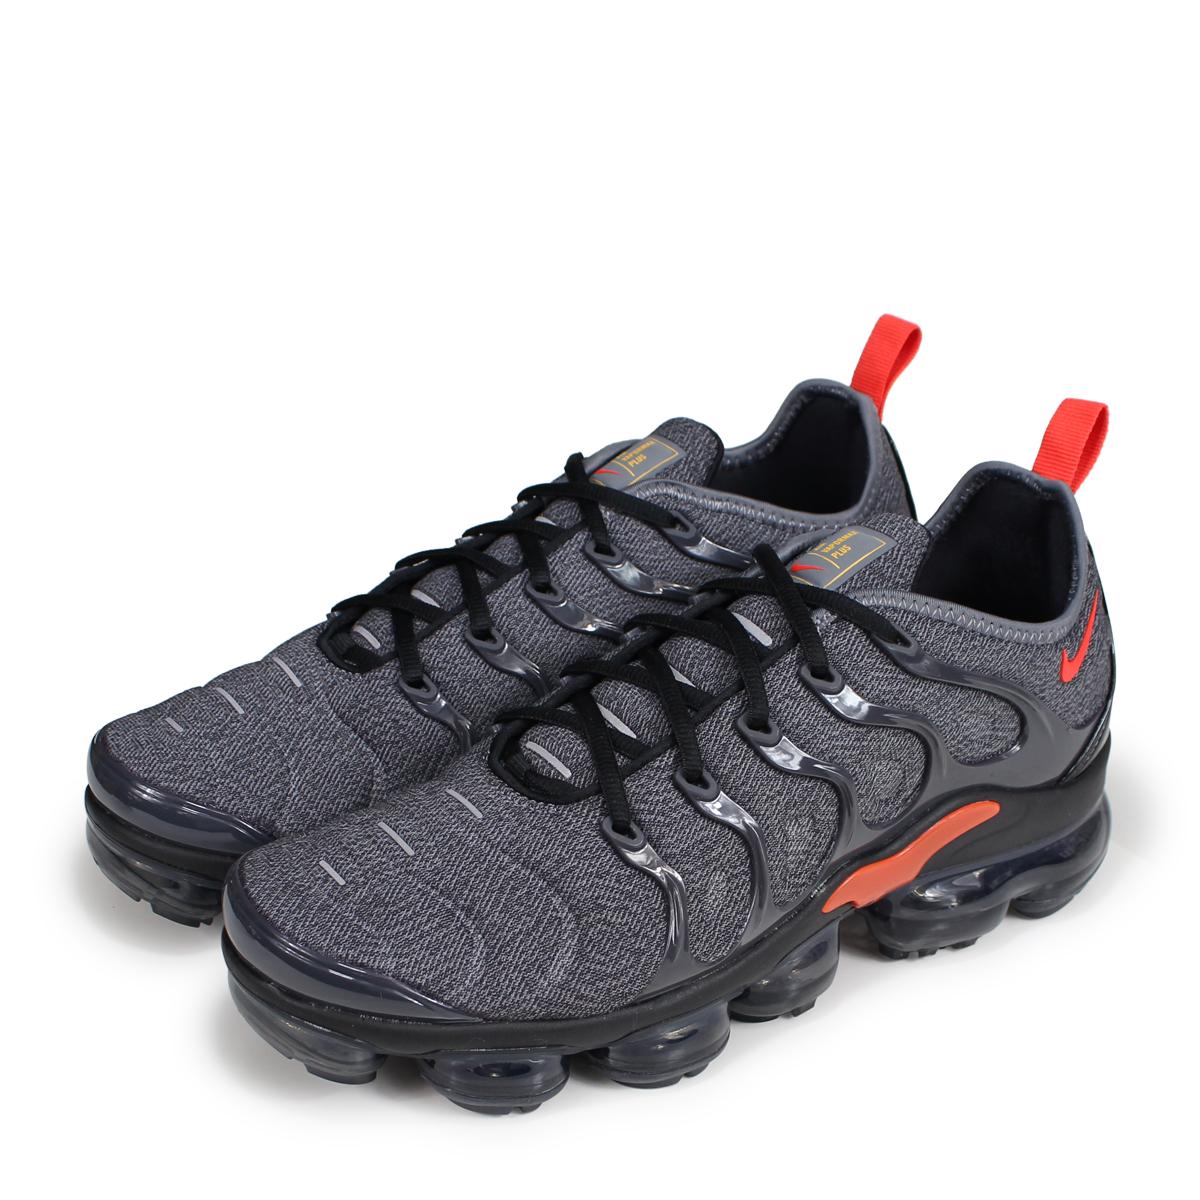 42c72550fea5c ALLSPORTS  NIKE AIR VAPORMAX PLUS Nike air vapor max plus sneakers ...